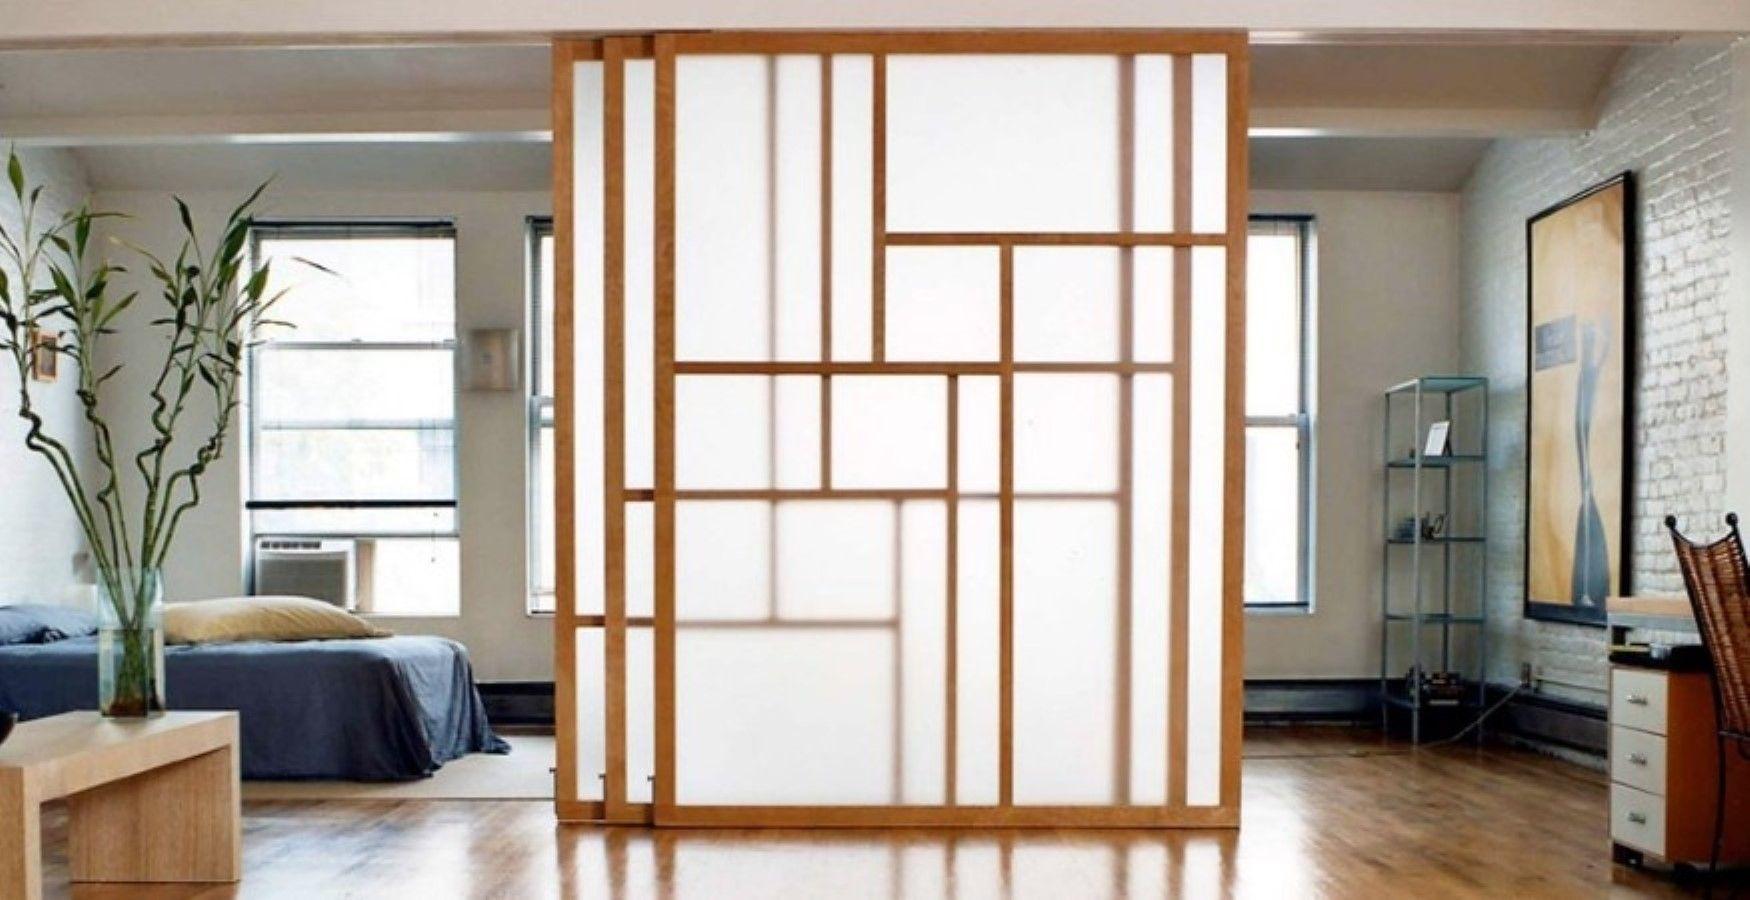 4-Ciri-Arsitektur-Jepang-Yang-Perlu-Anda-Ketahui-2